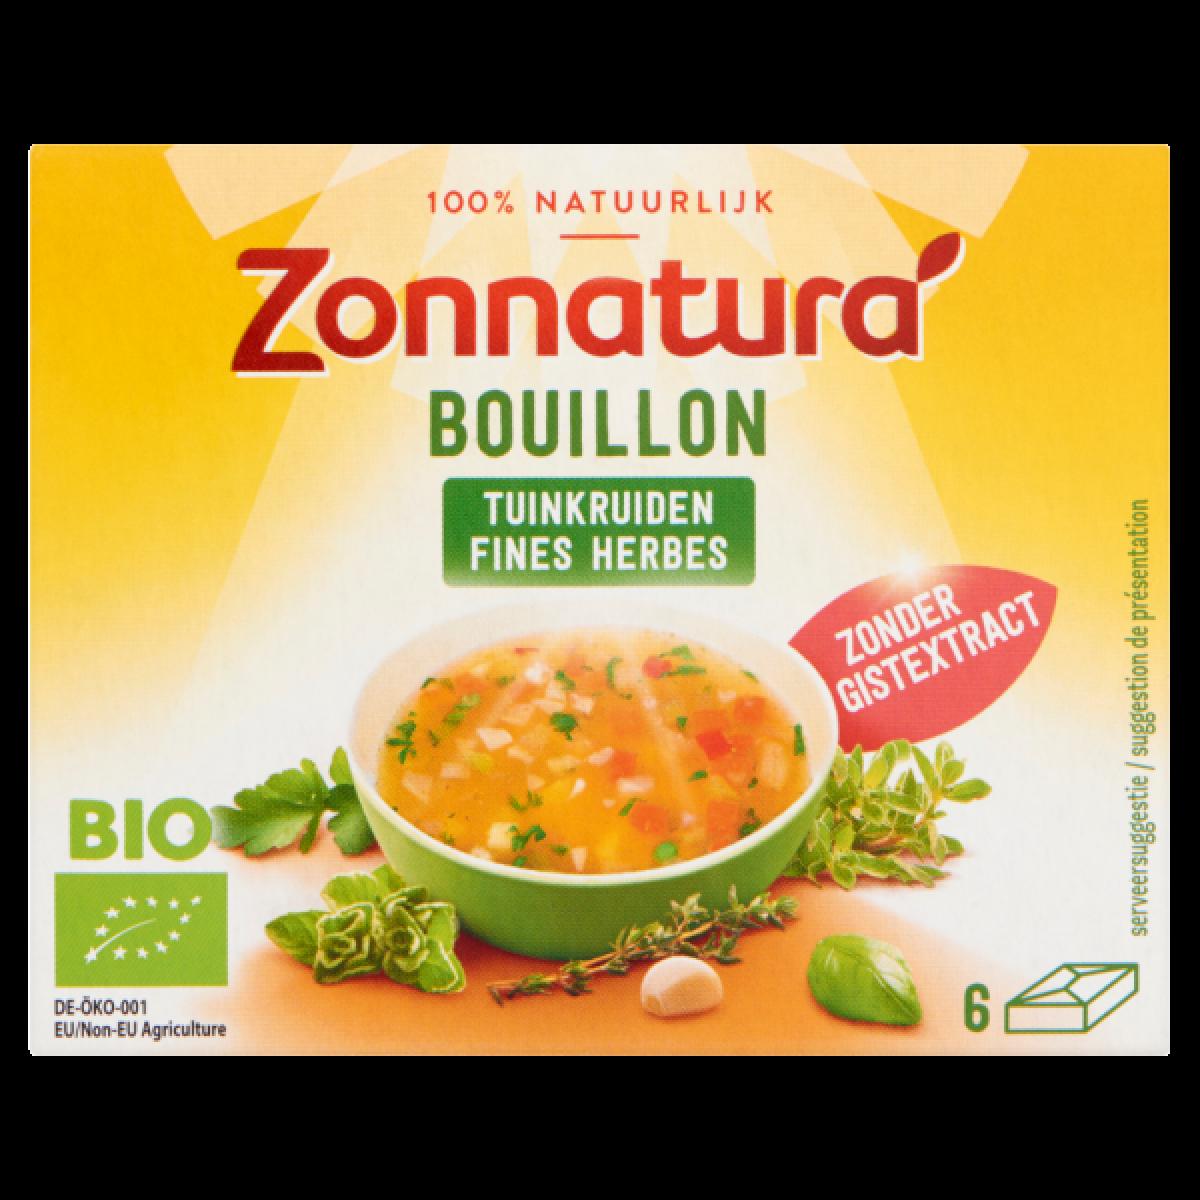 Bouillon Tuinkruiden Zonder Gist